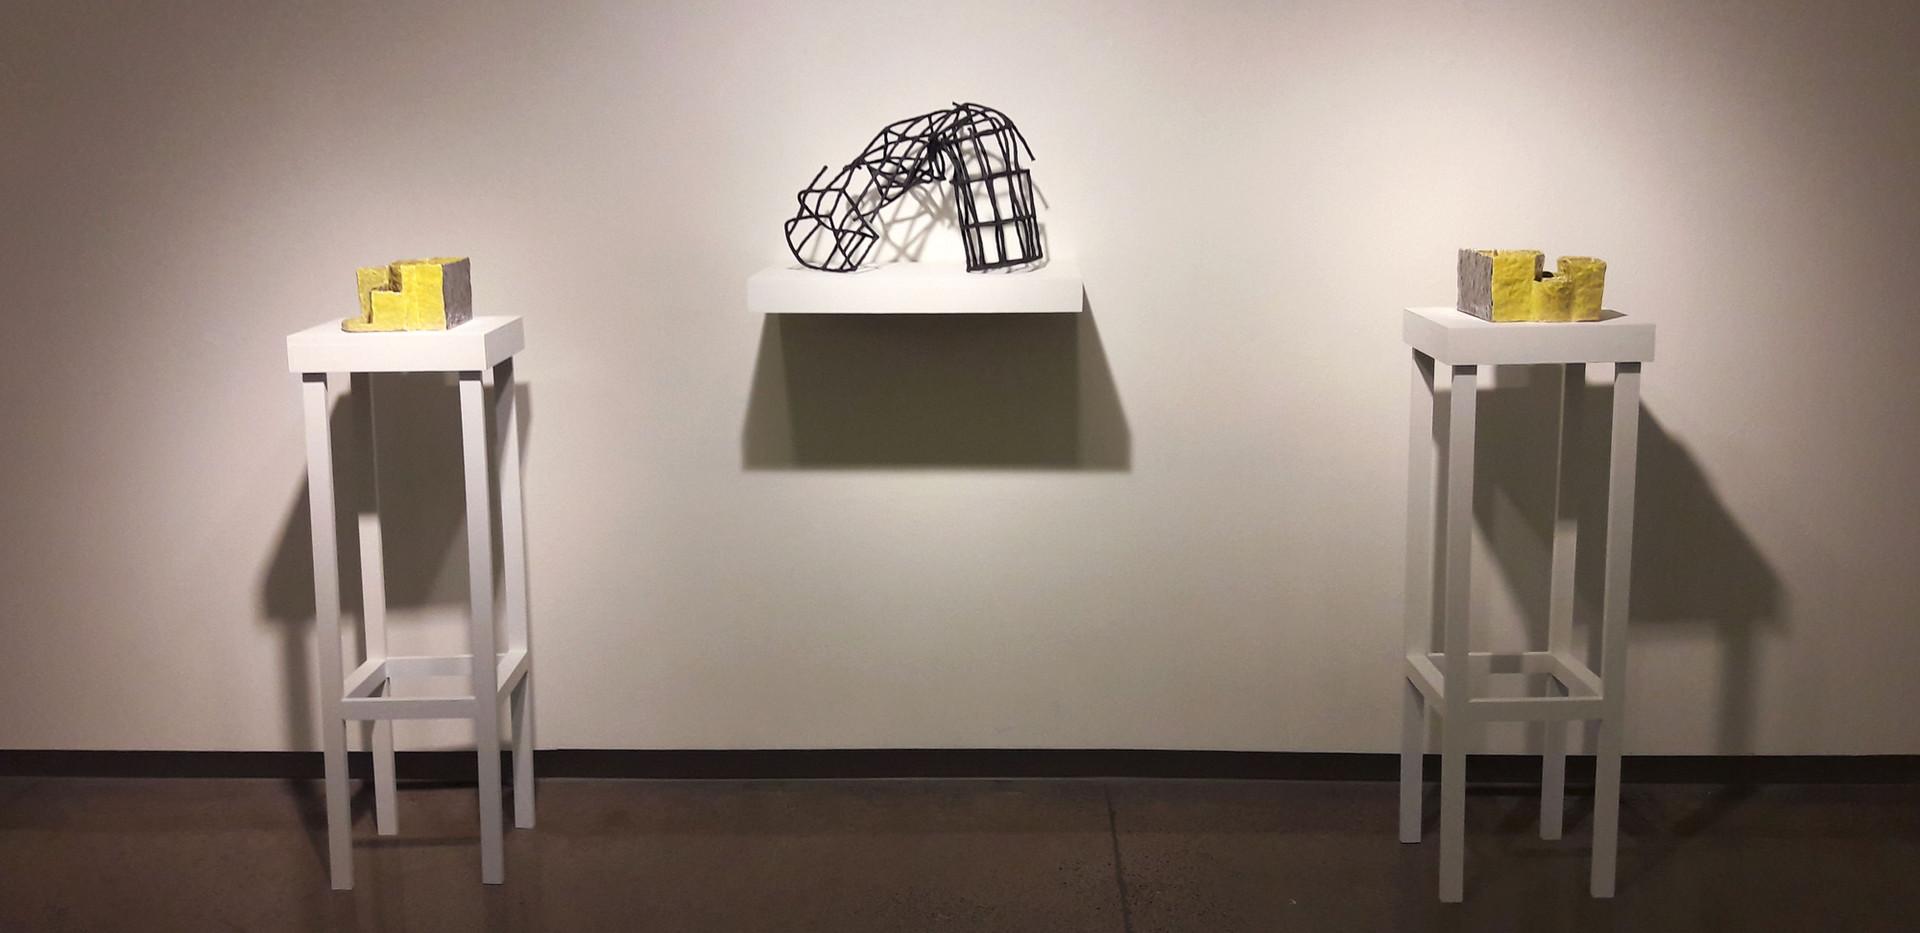 show install east wall.jpg